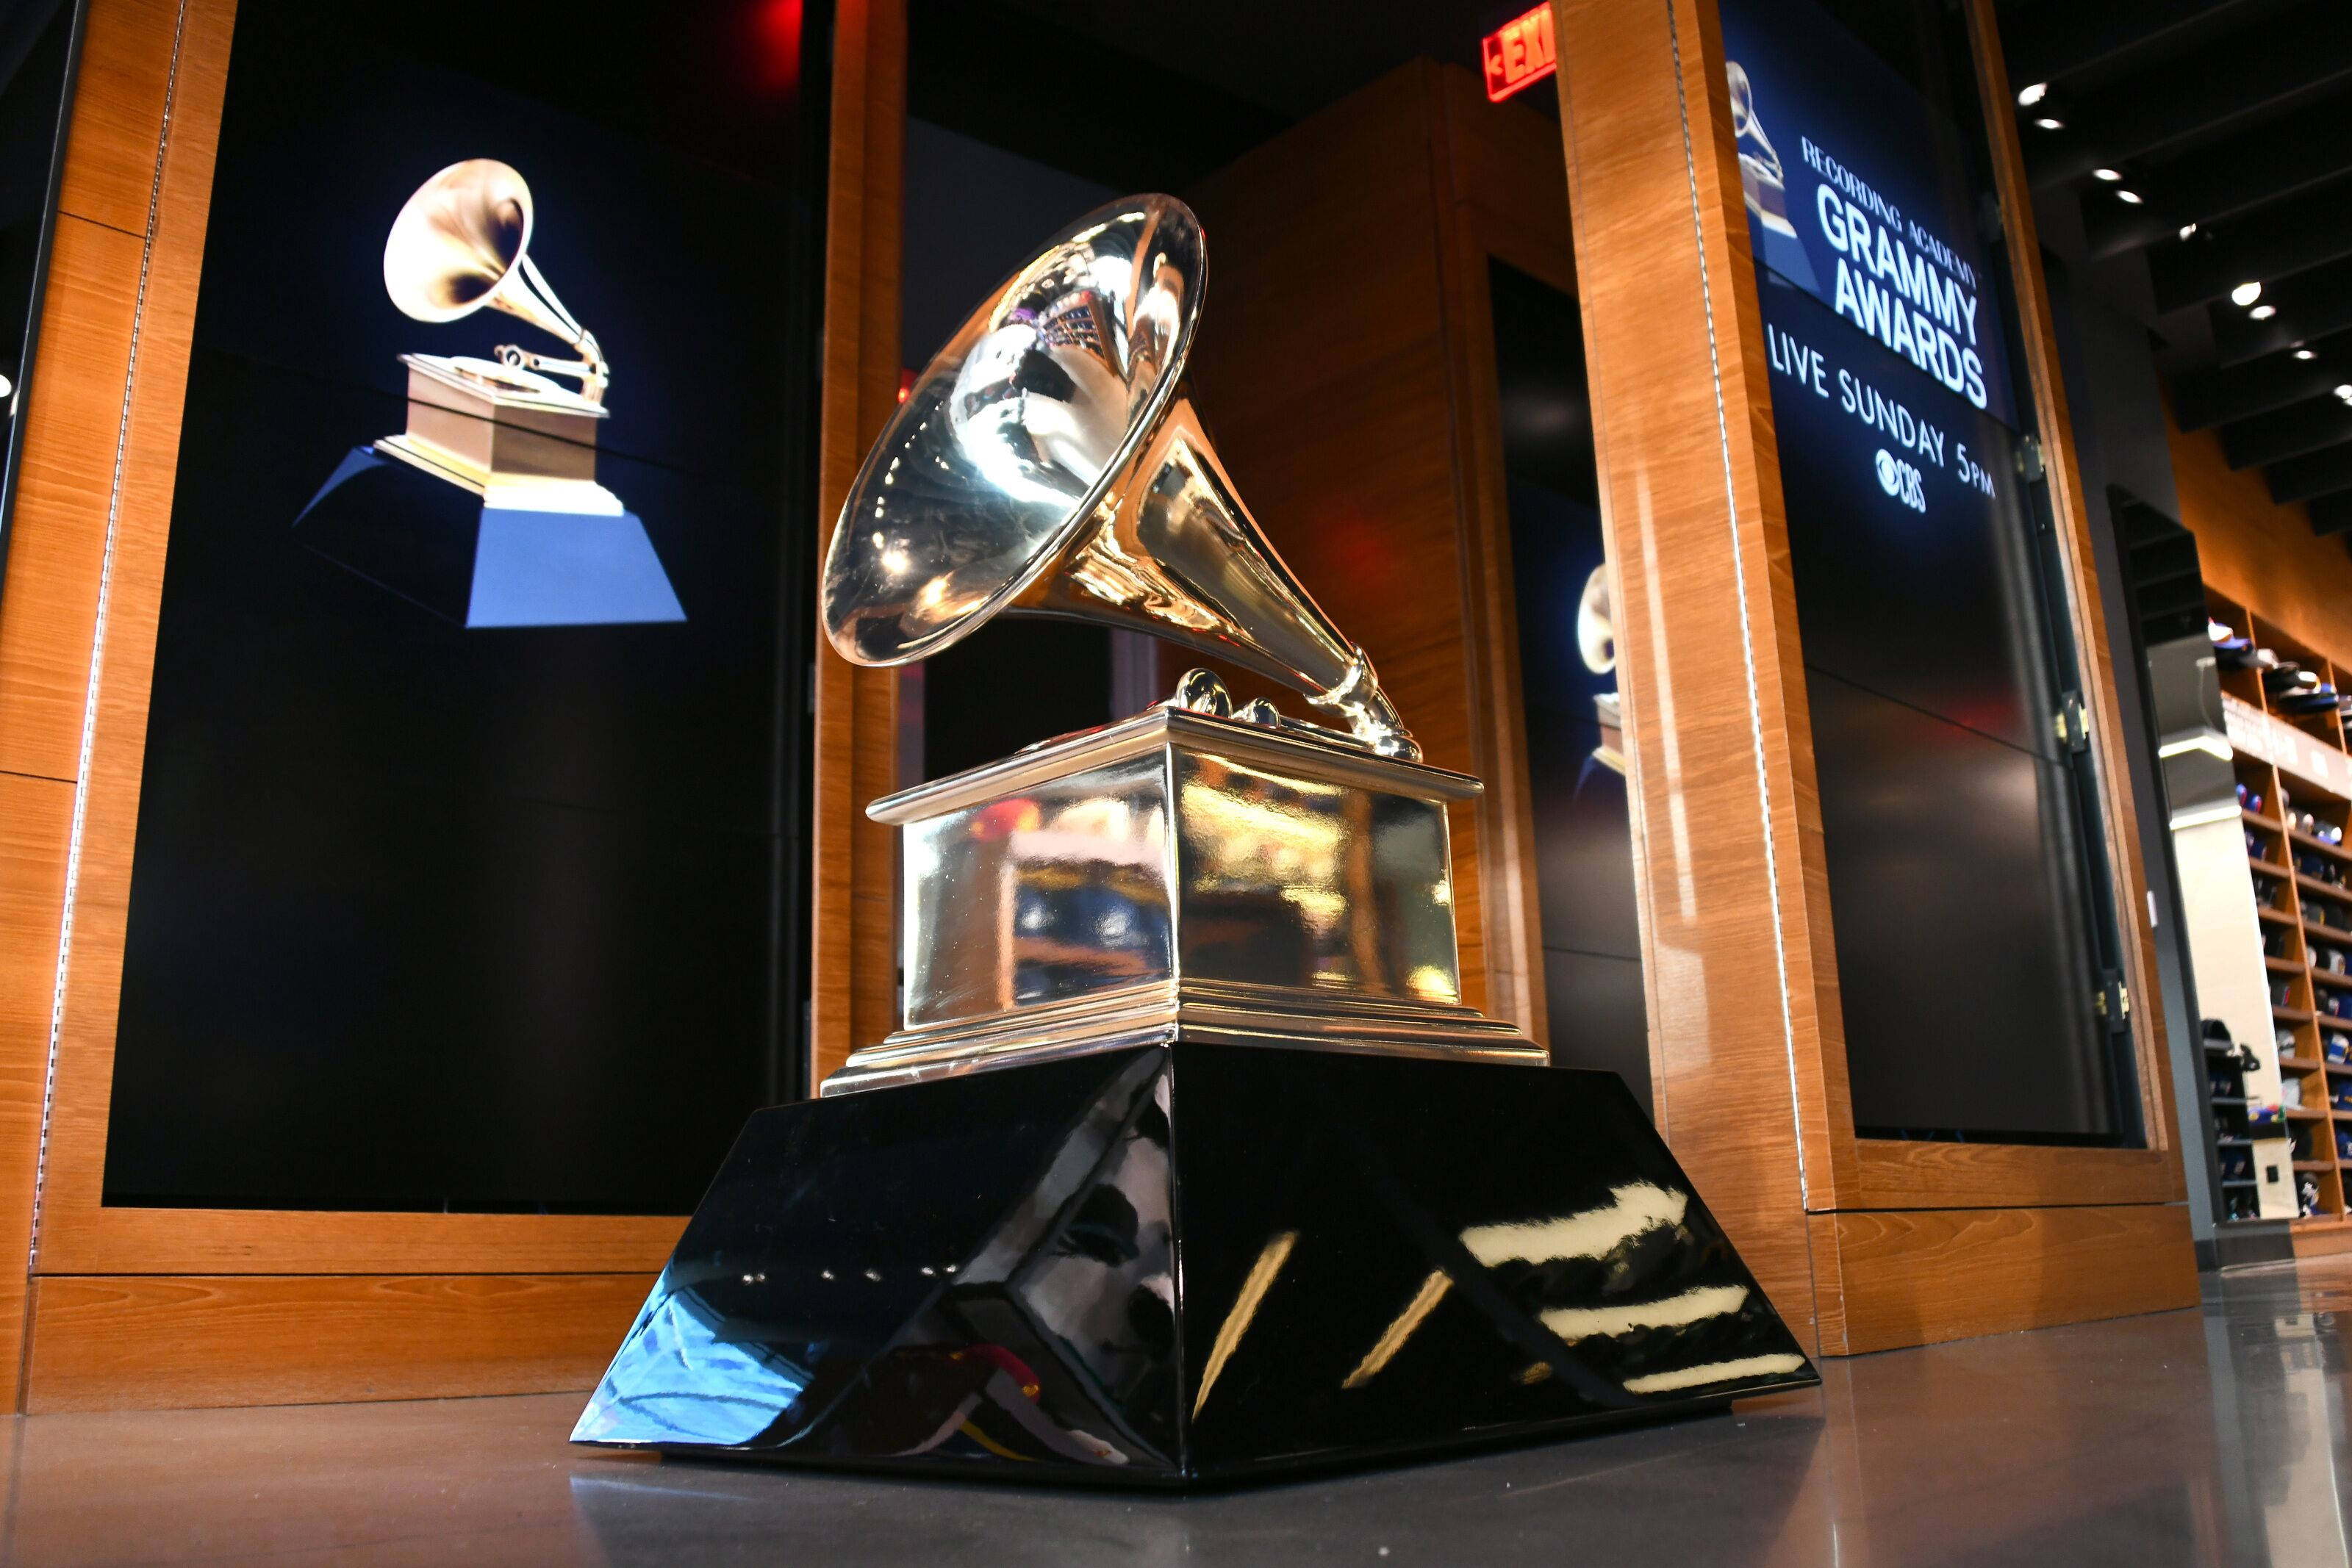 Grammy Awards 2019 Live: Watch The Grammy Awards 2019 Live: Free Live Streaming